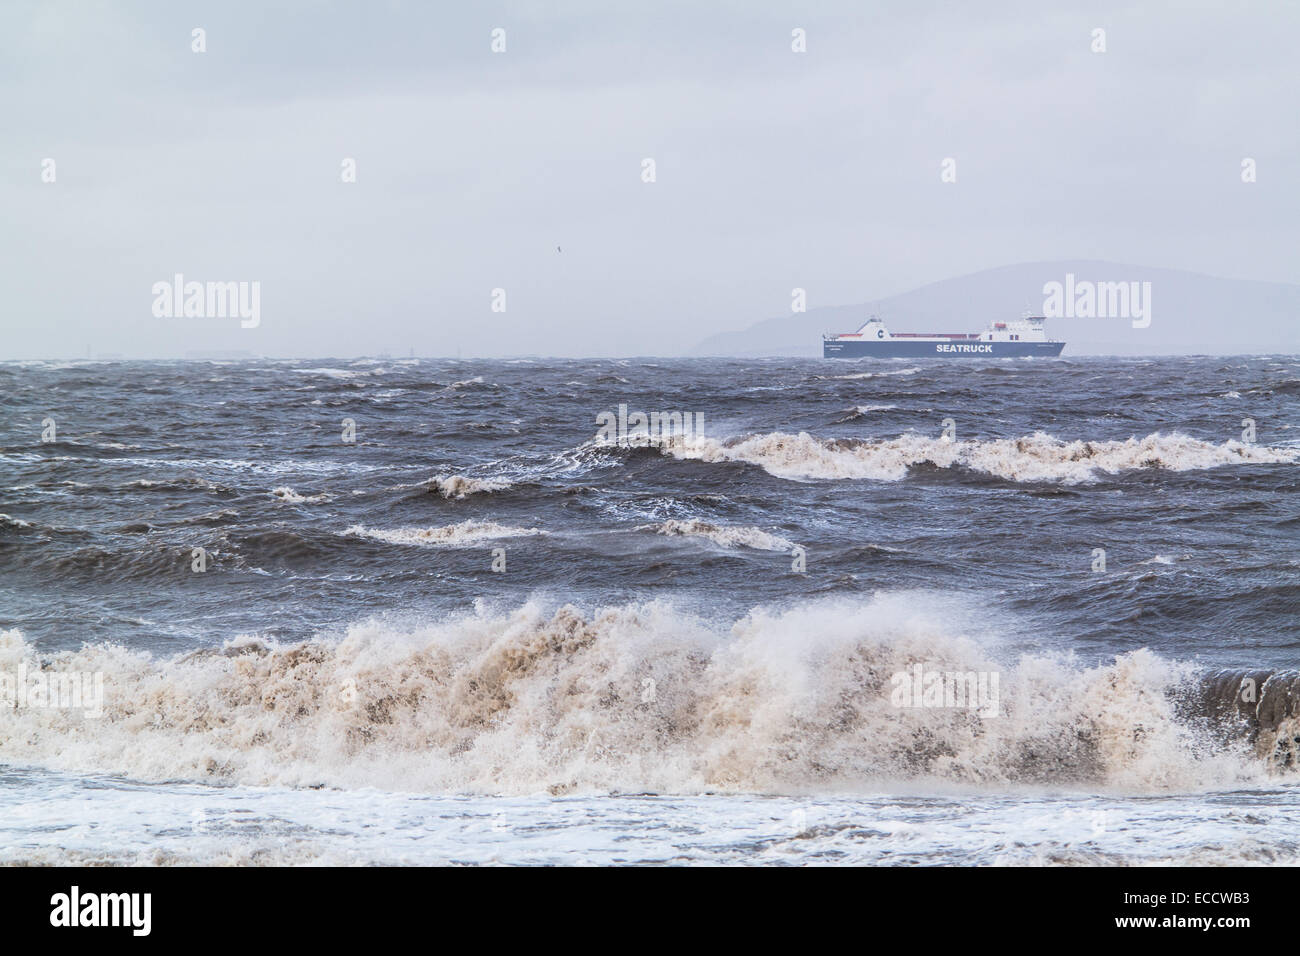 Fleetwood, Lancashire, UK. 11th December, 2014. The seas around the Lancashire coast are still very rough following - Stock Image